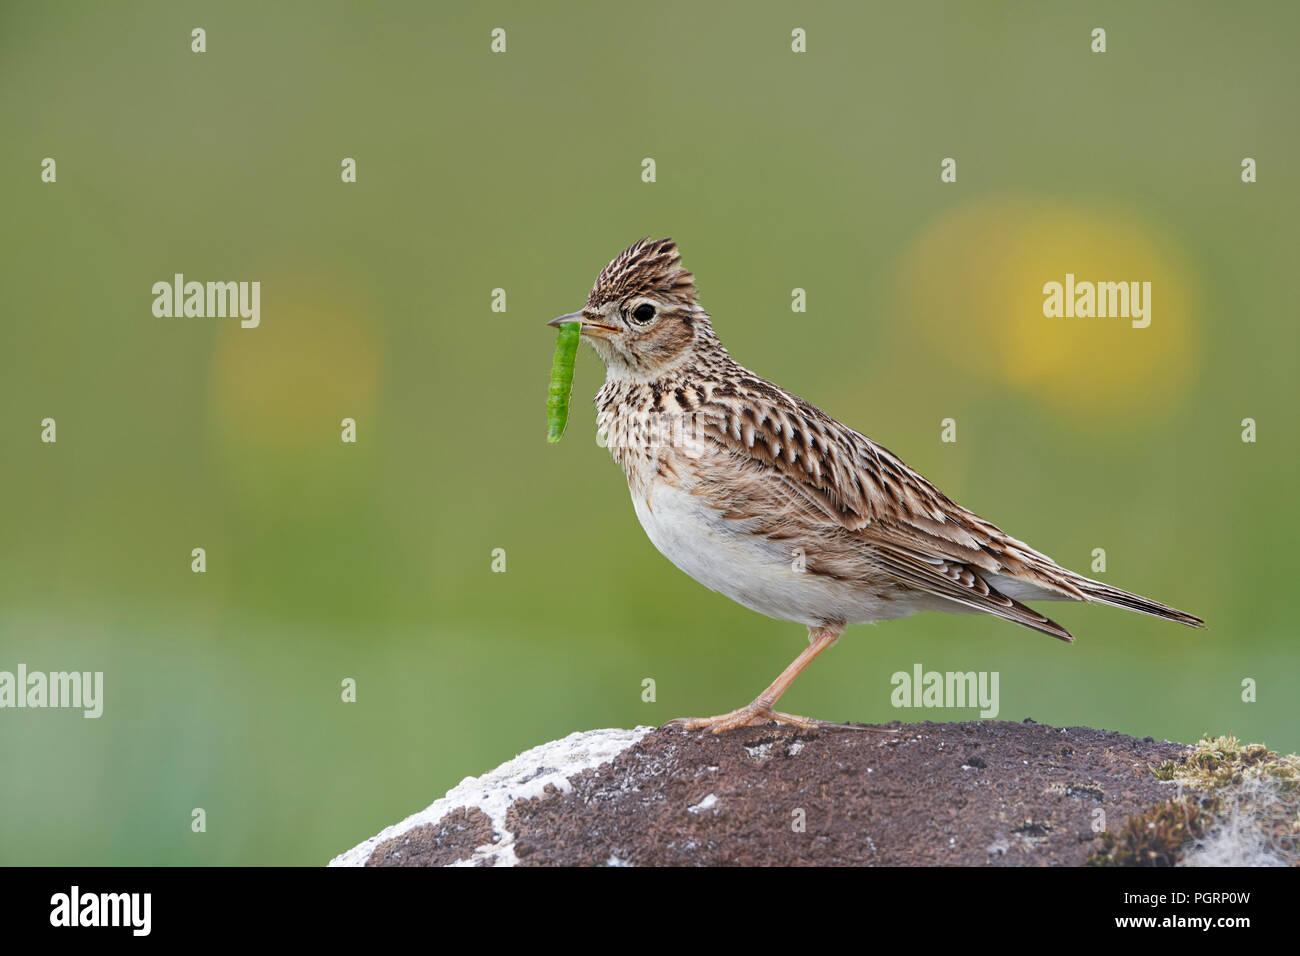 Skylark, Alauda arvensis, UK - Stock Image